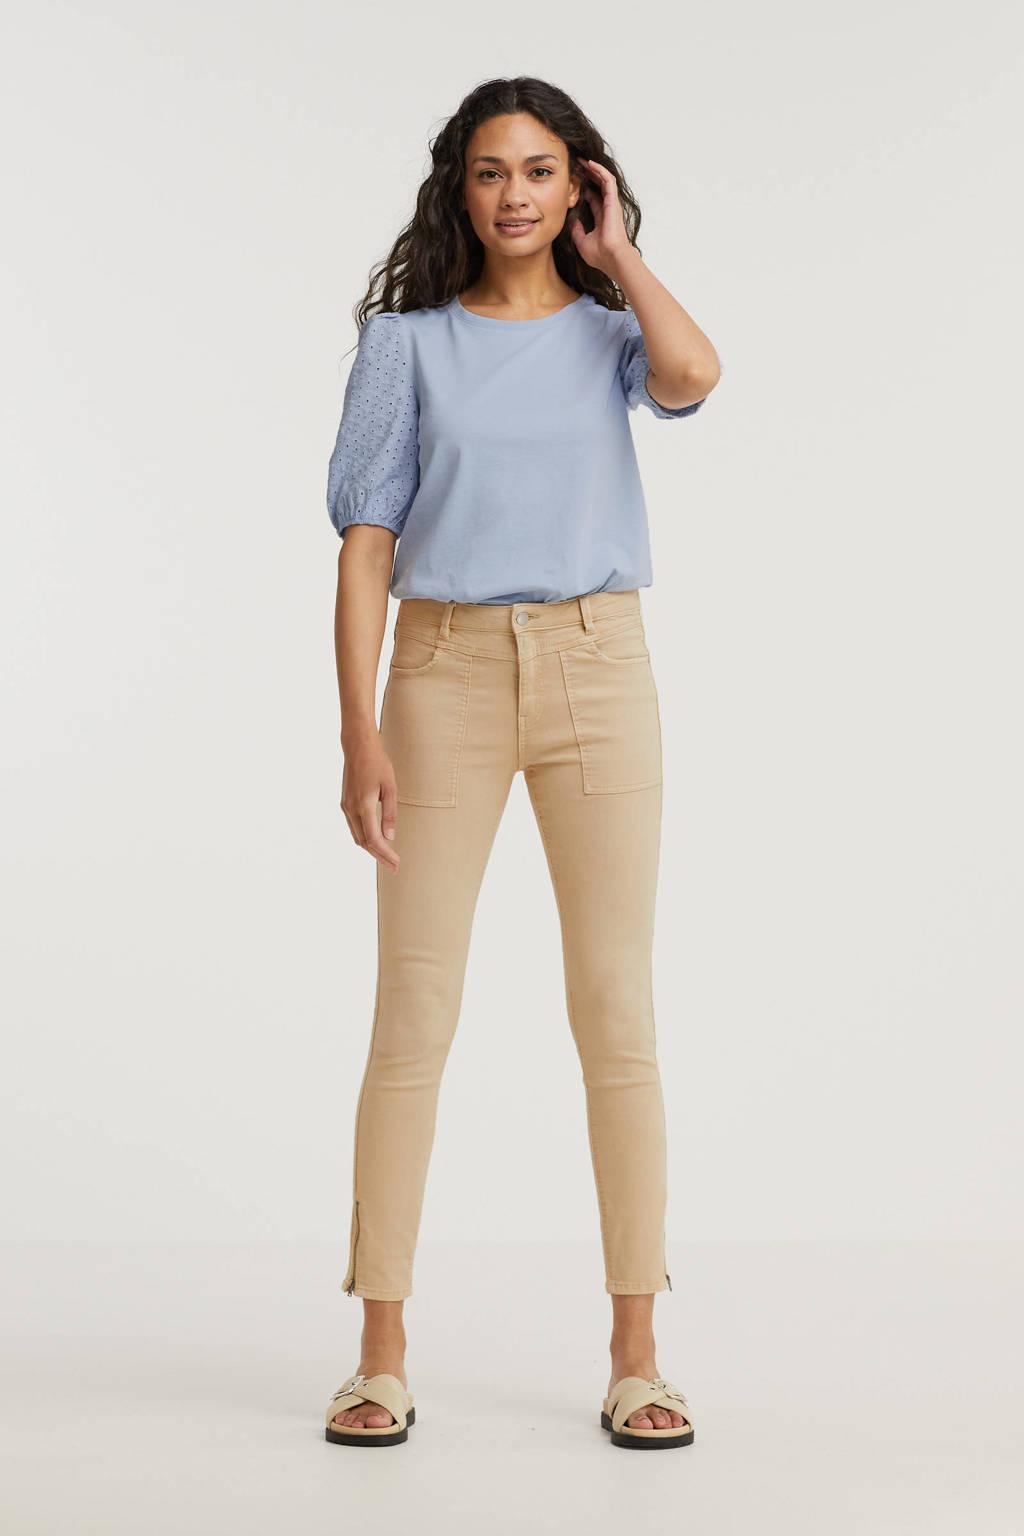 edc Women skinny broek beige, Beige